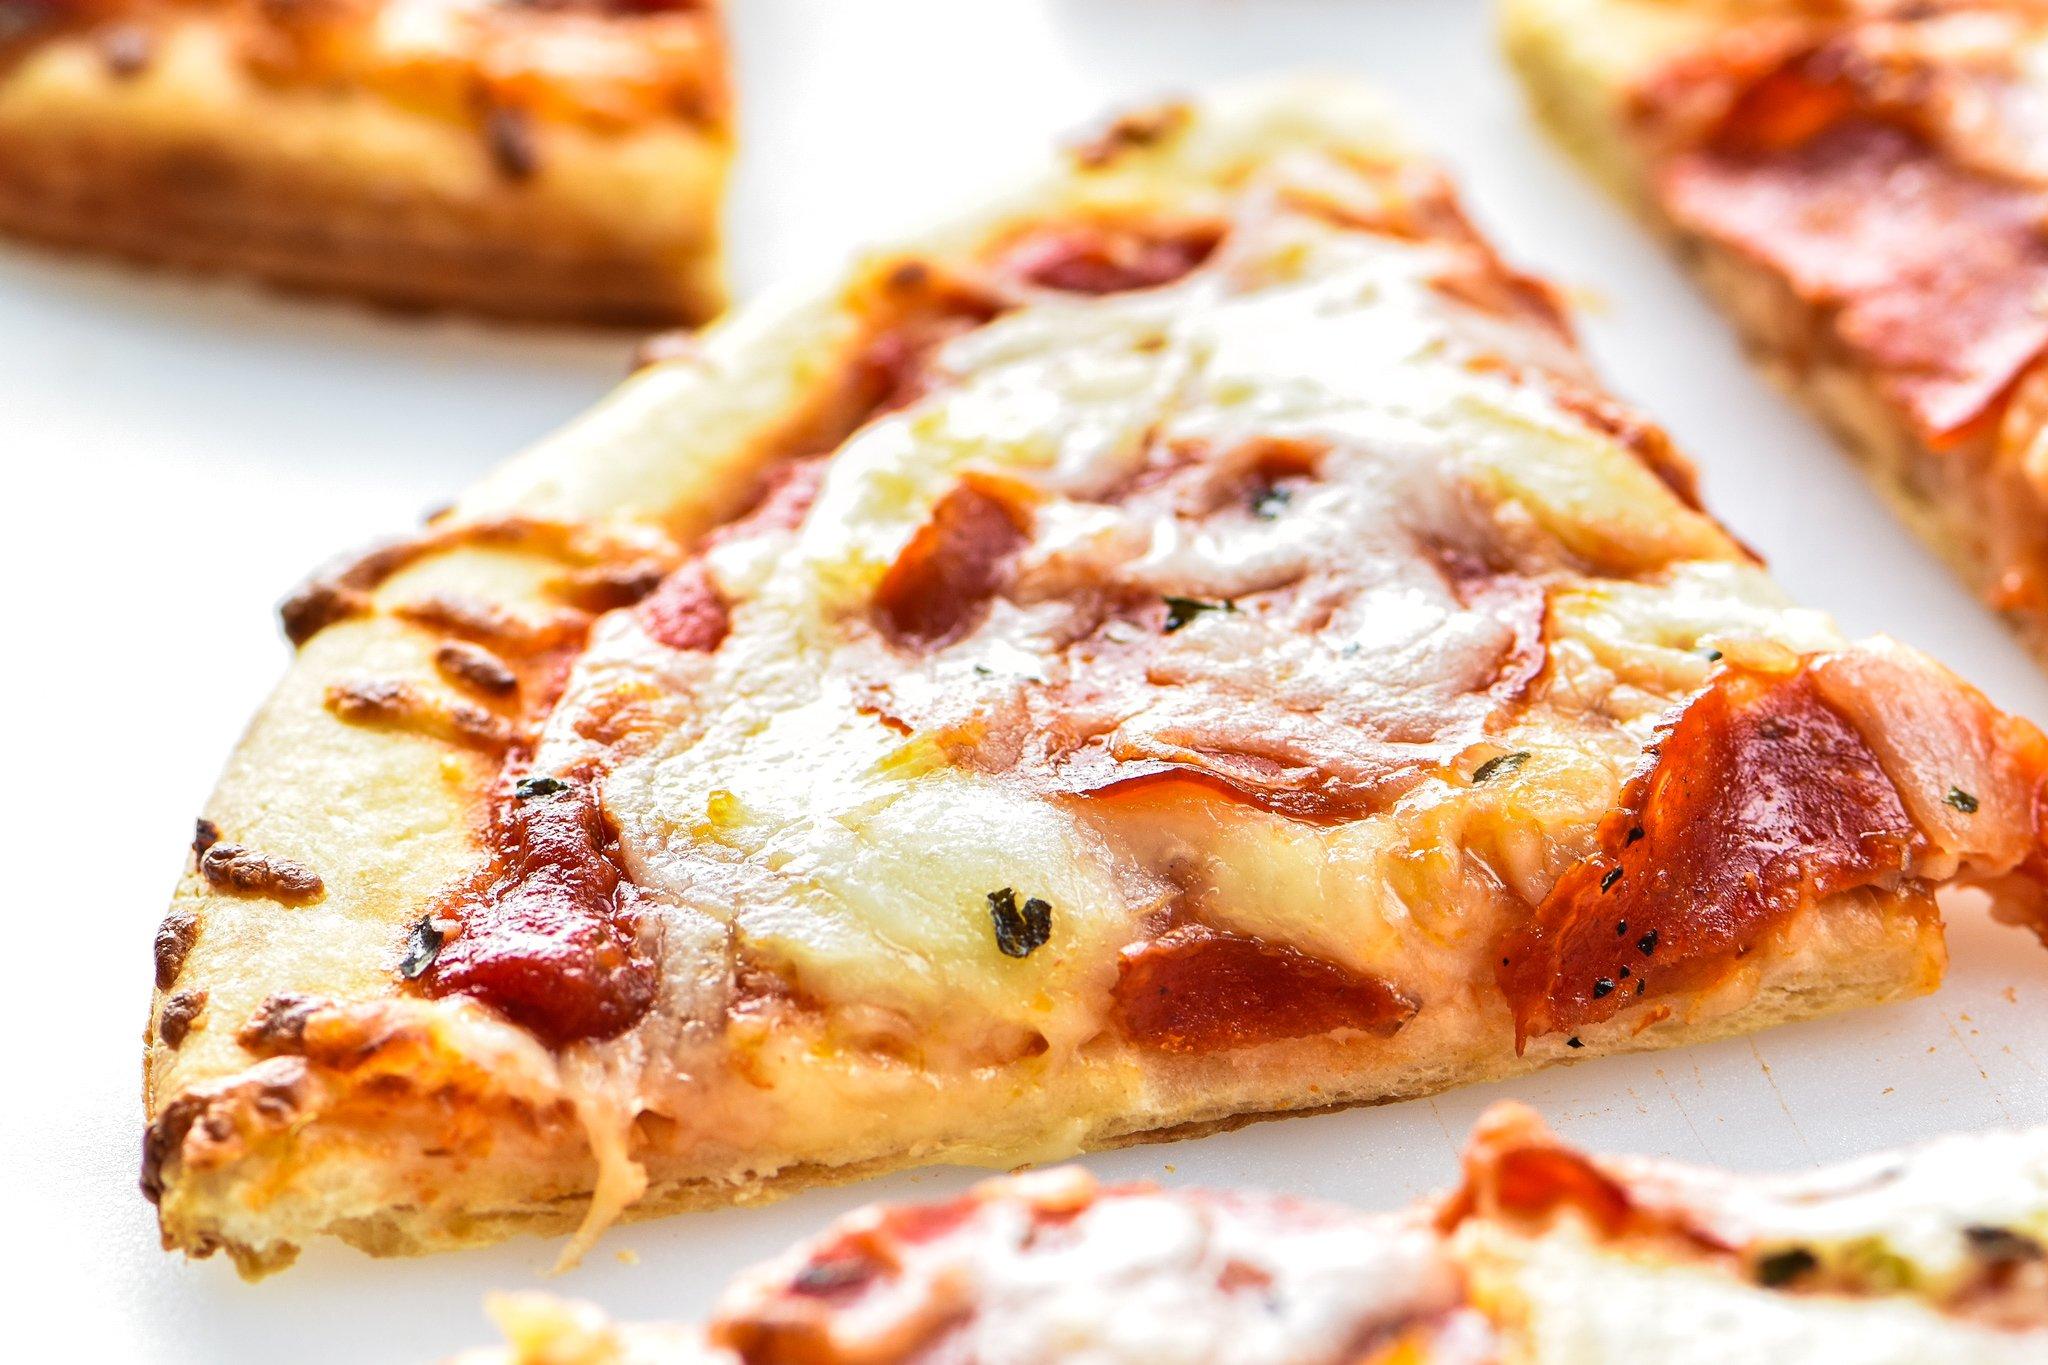 How to Make and Freeze Homemade Pizza Sauce - Big batch pizza sauce recipe to prep ahead so you can have homemade pizza sauce in 10 minutes! - ProjectMealPlan.com